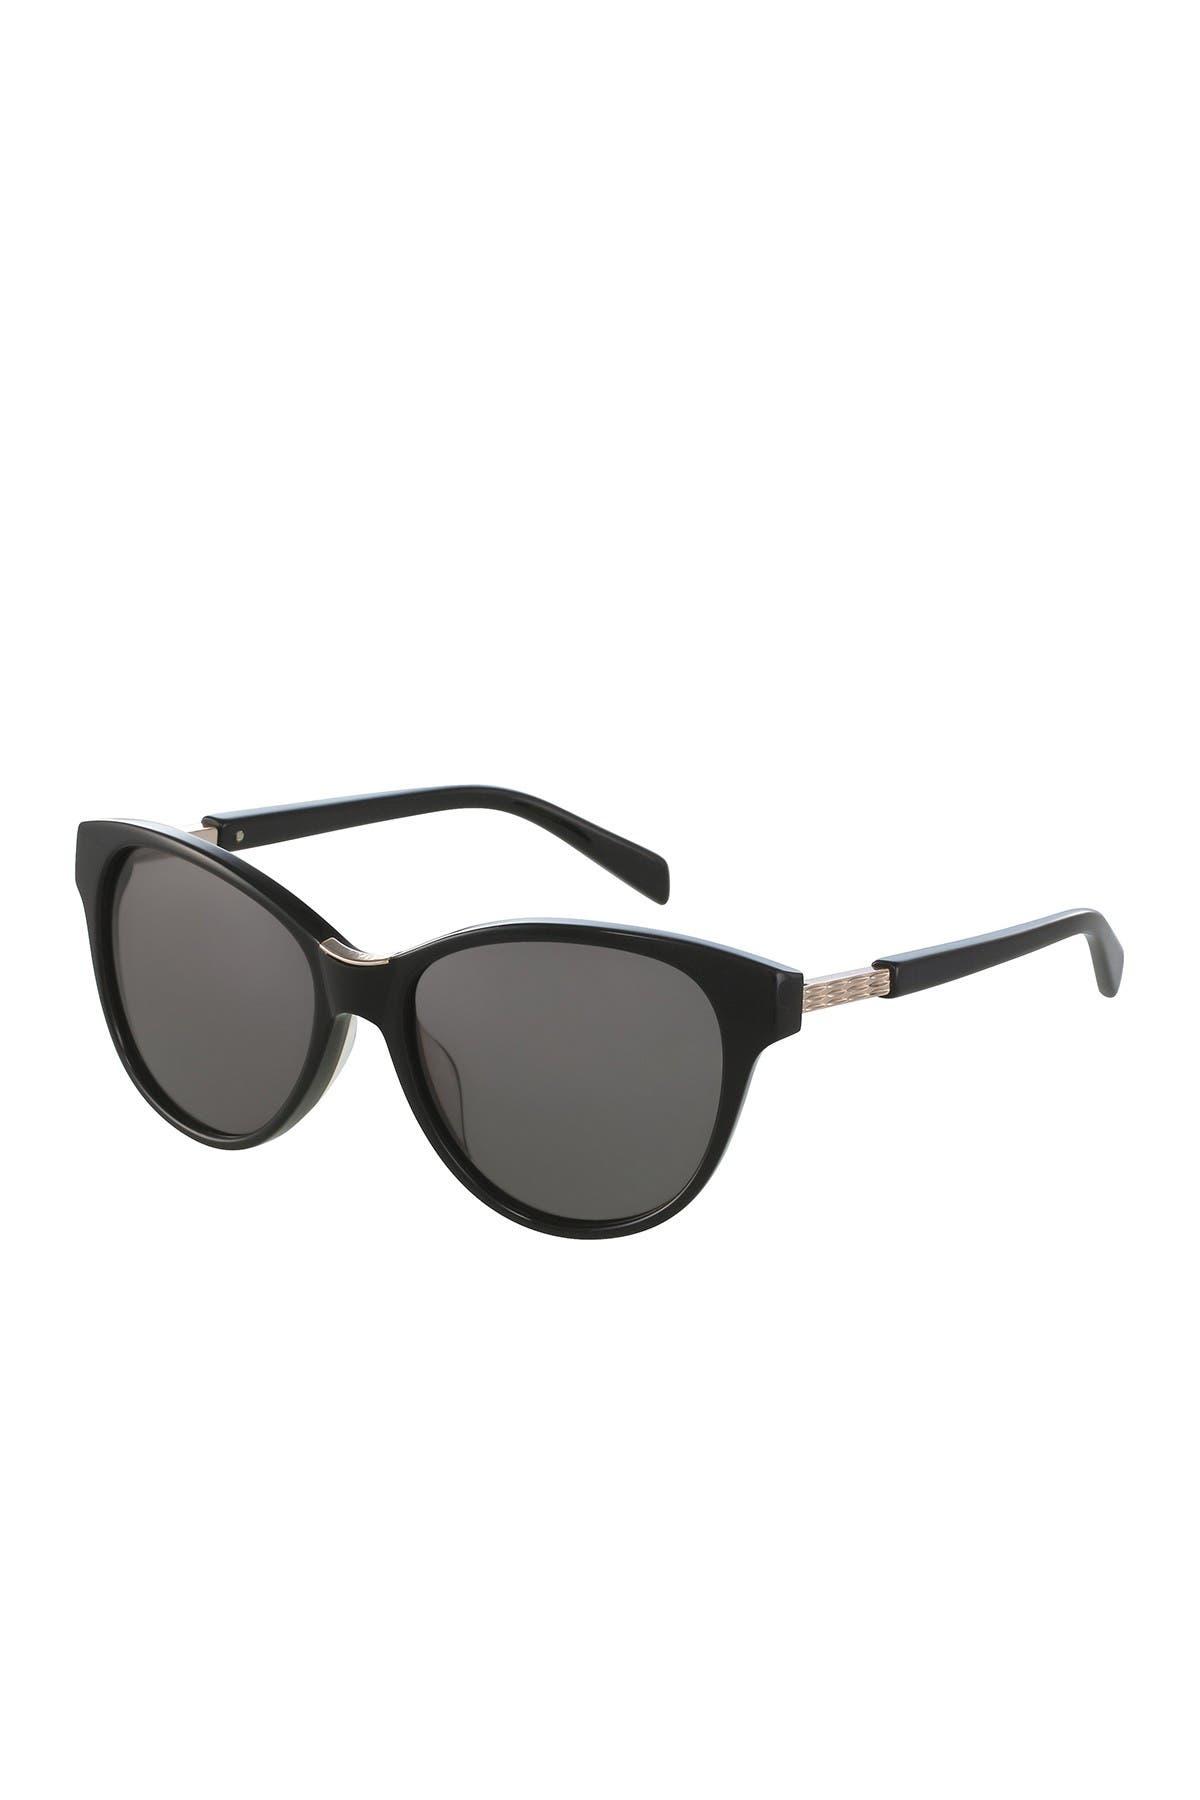 Image of Balmain 54mm Modified Cat Eye Sunglasses